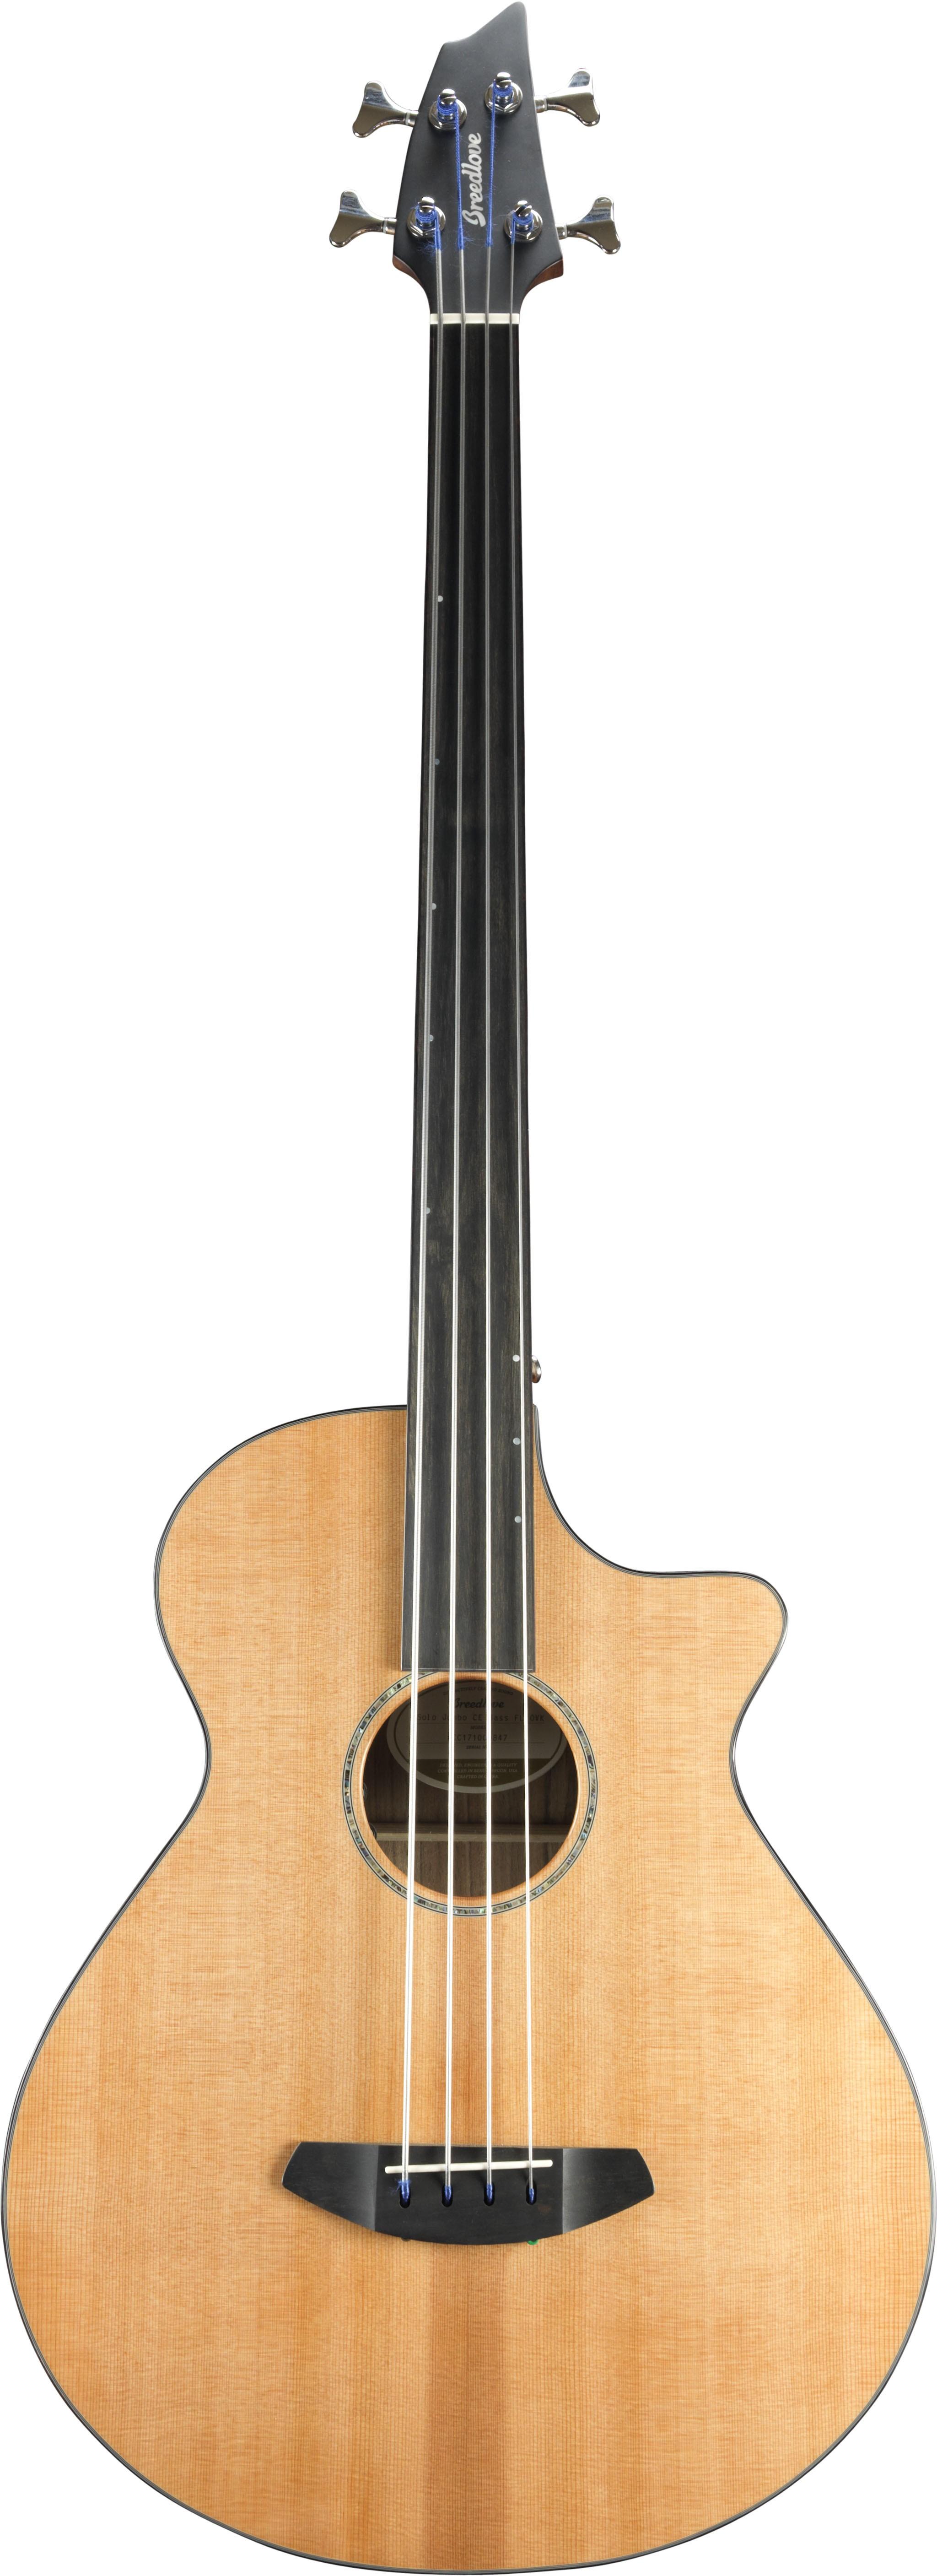 Breedlove Solo Jumbo Fretless Bass CE